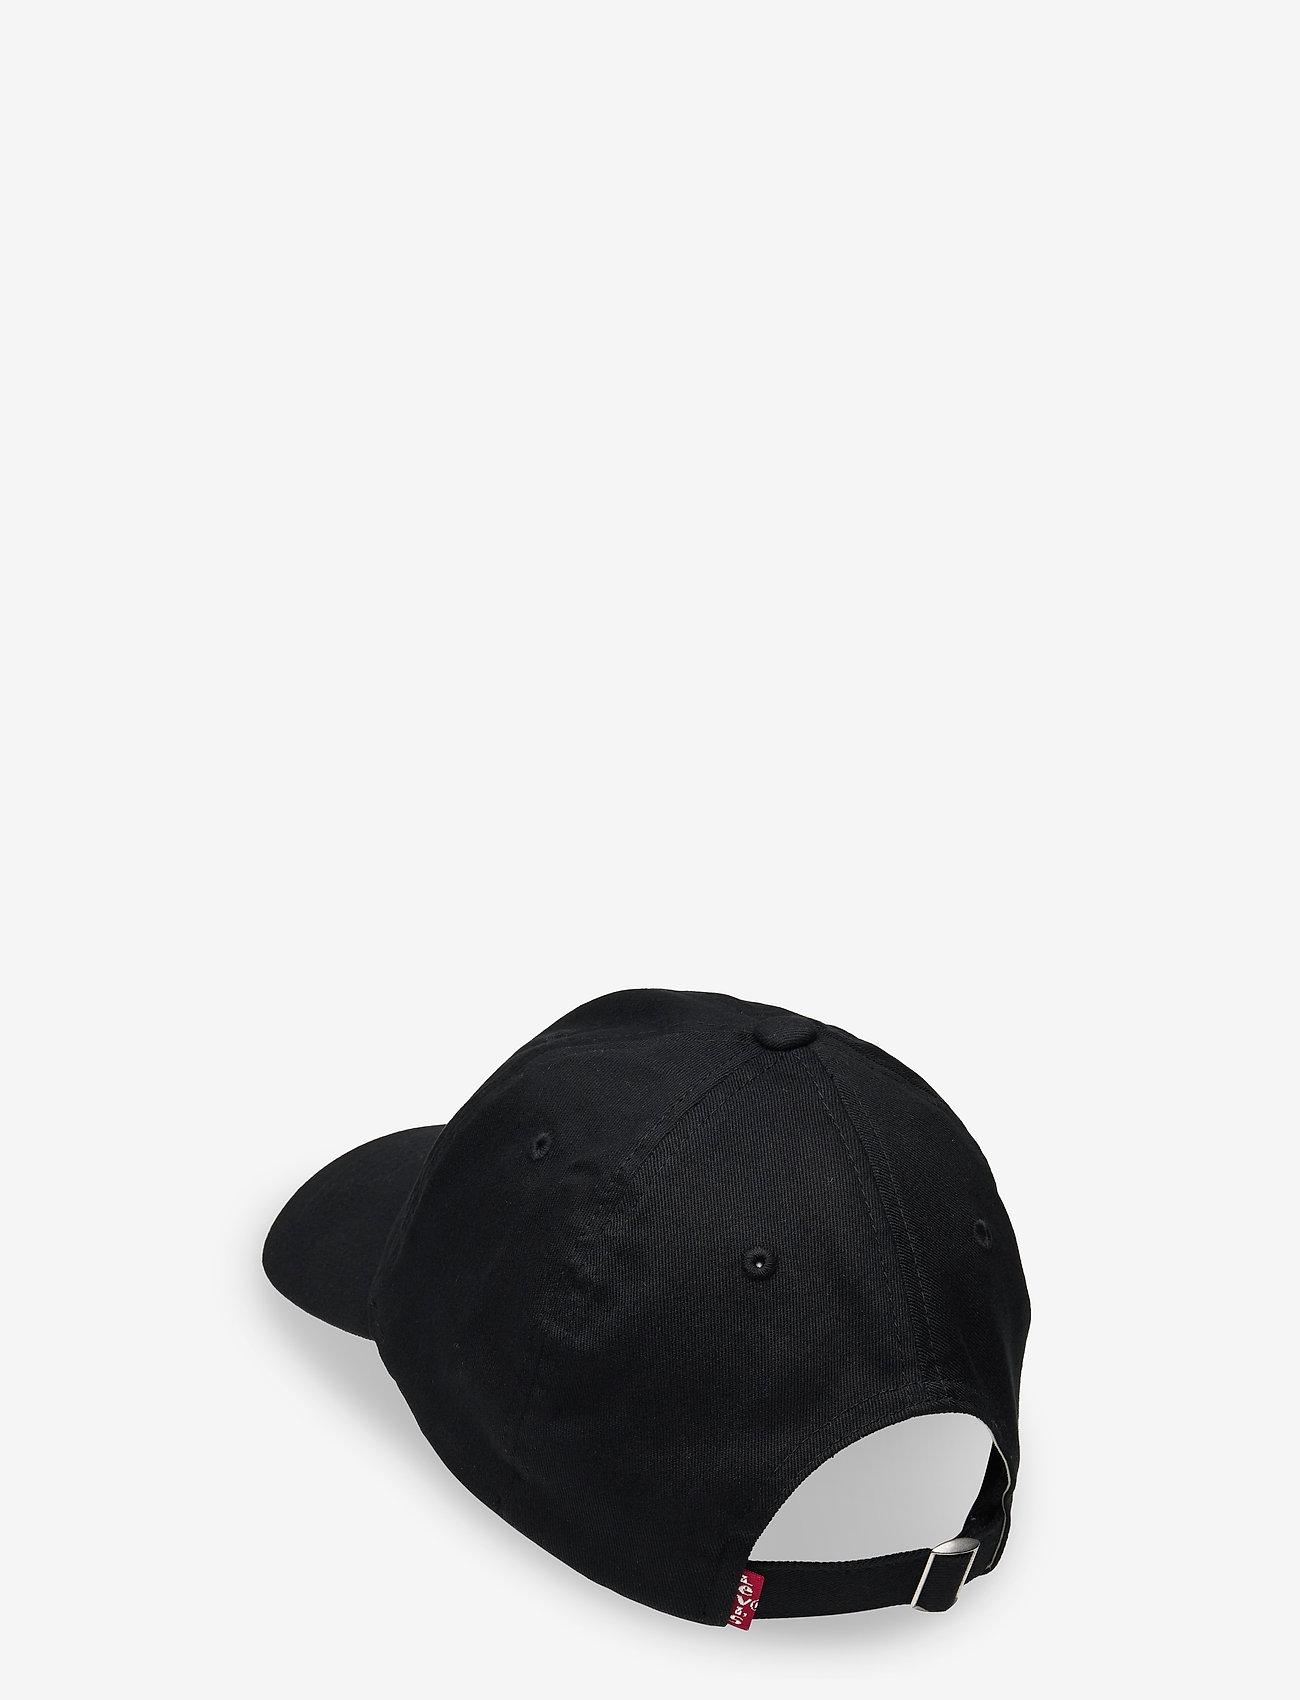 Levi's Footwear & Acc - VINTAGE MODERN FLEXFIT CAP - kepsar - regular black - 1